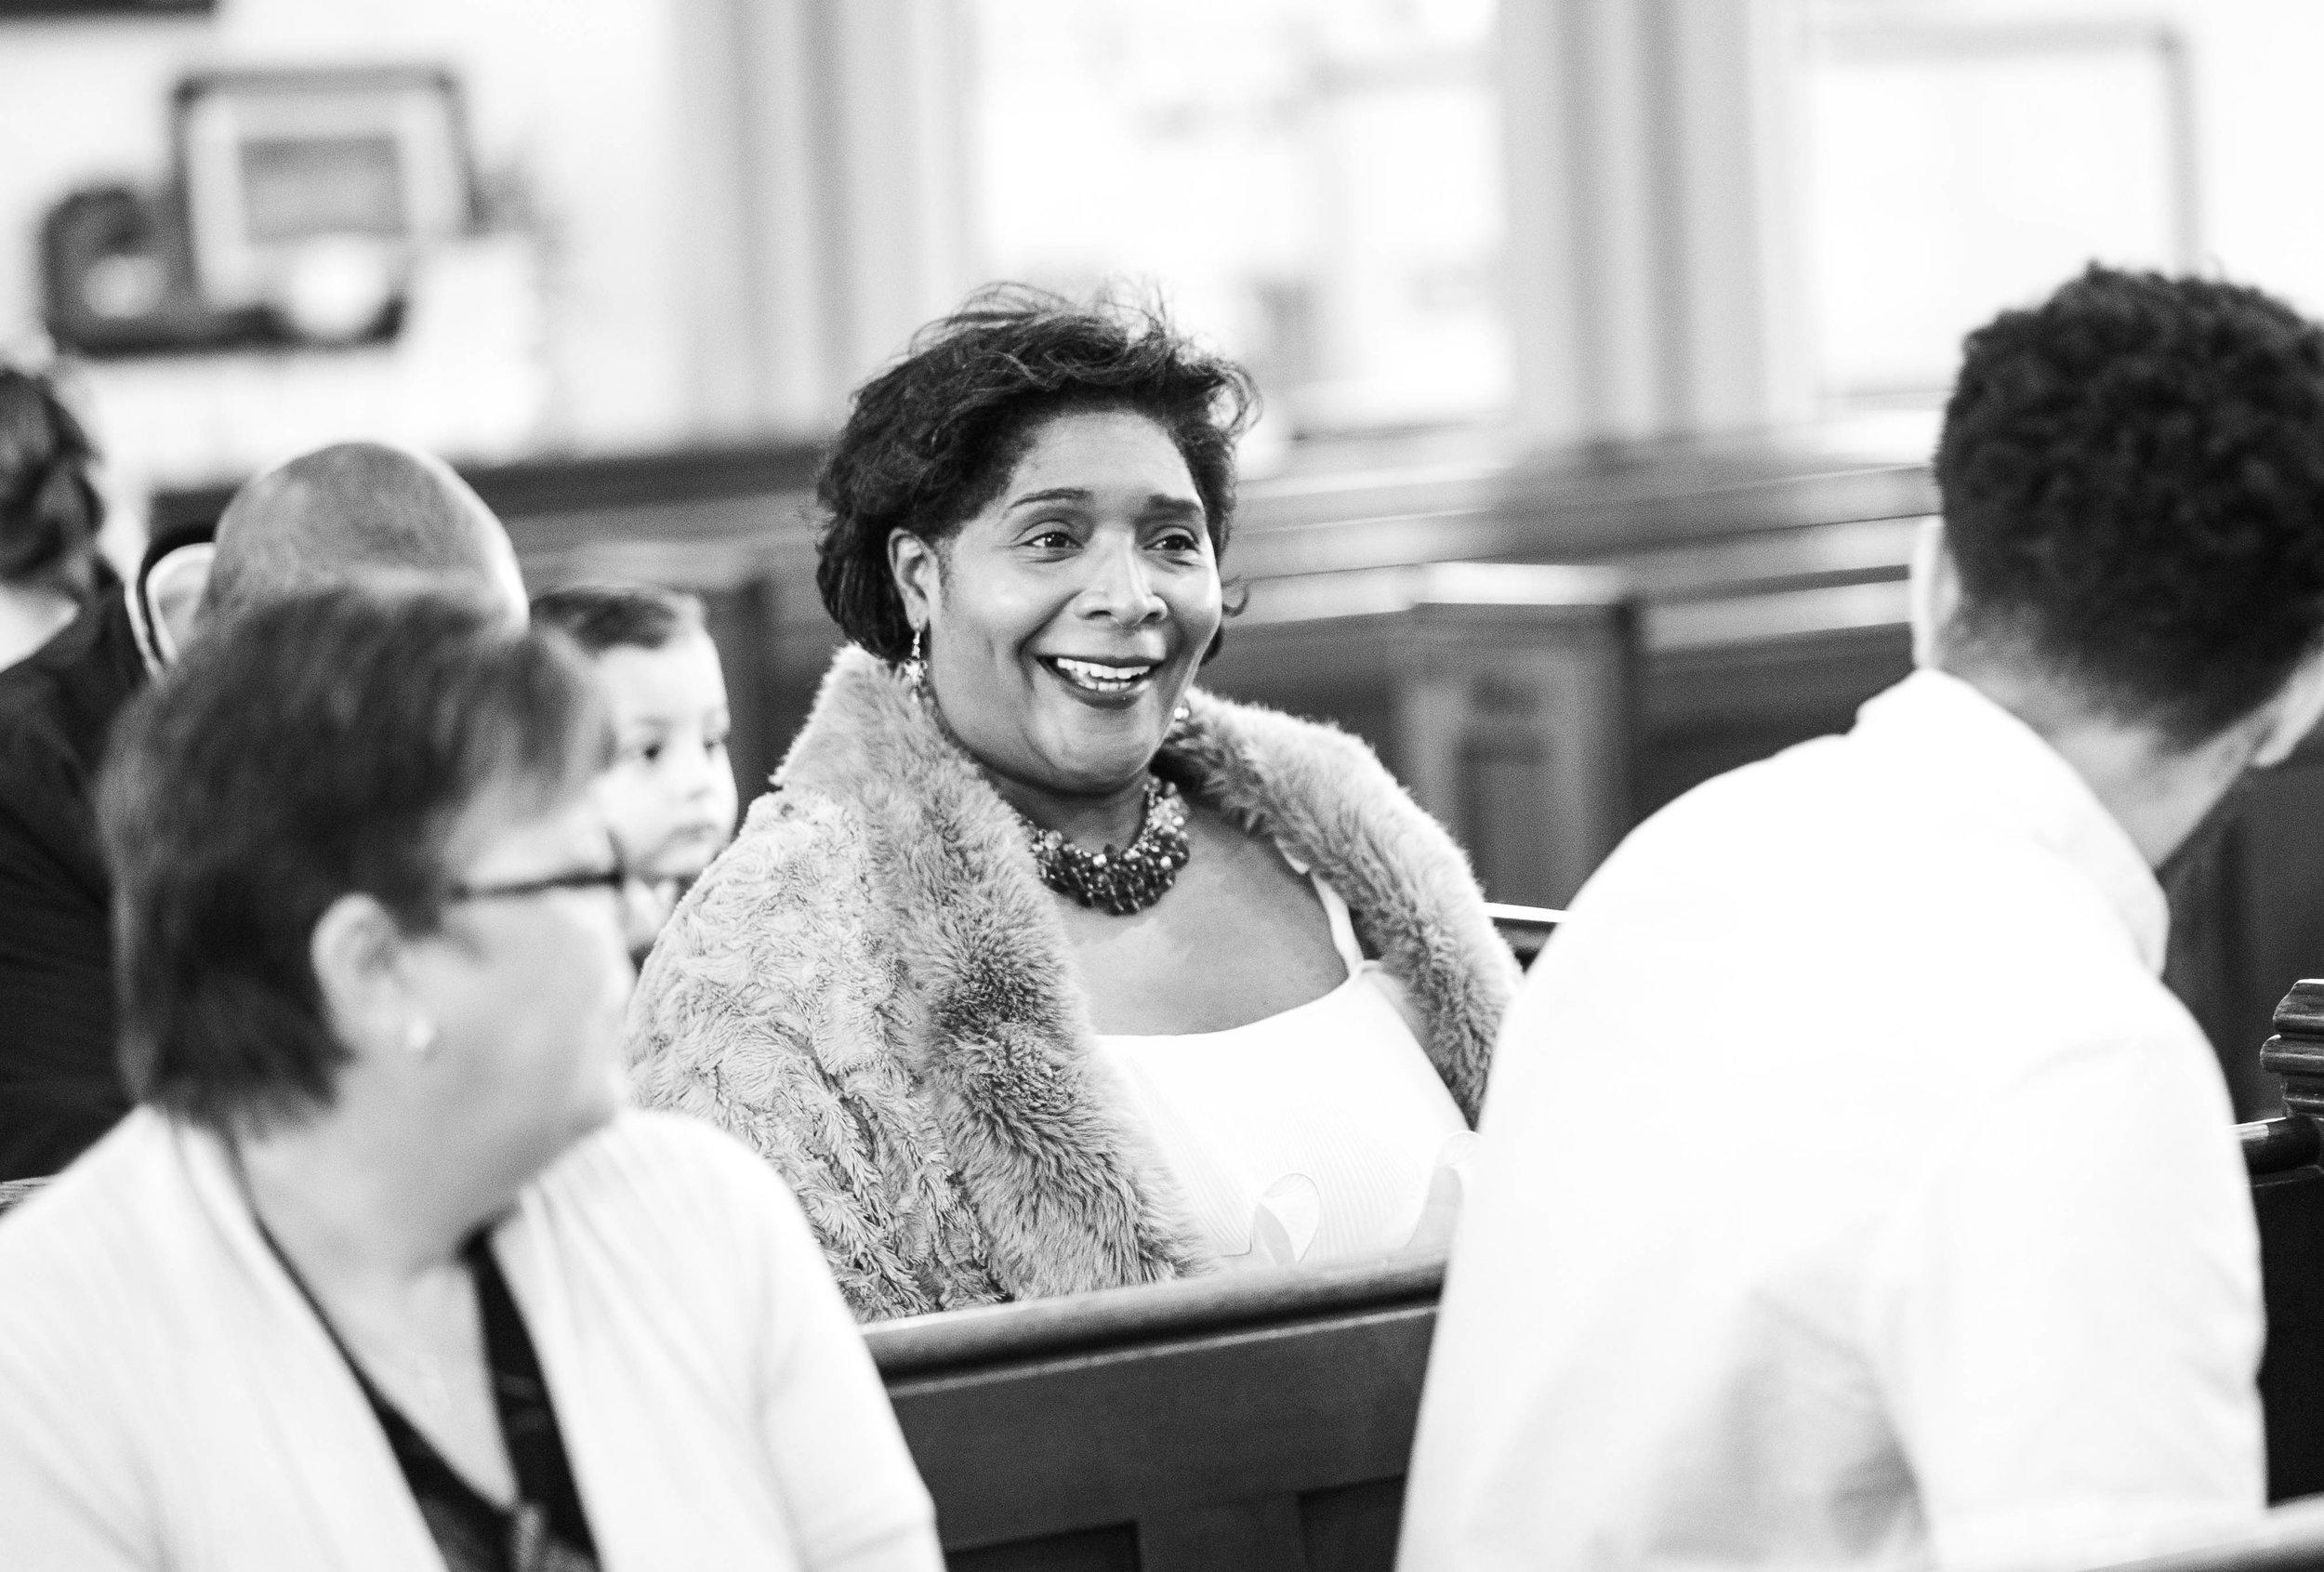 Lea-cooper-photography-christening-photographer-baptism-wolverhampton-wednesbury-walsall-willenhall-dudley-church-chapel-event-photography-5.jpg